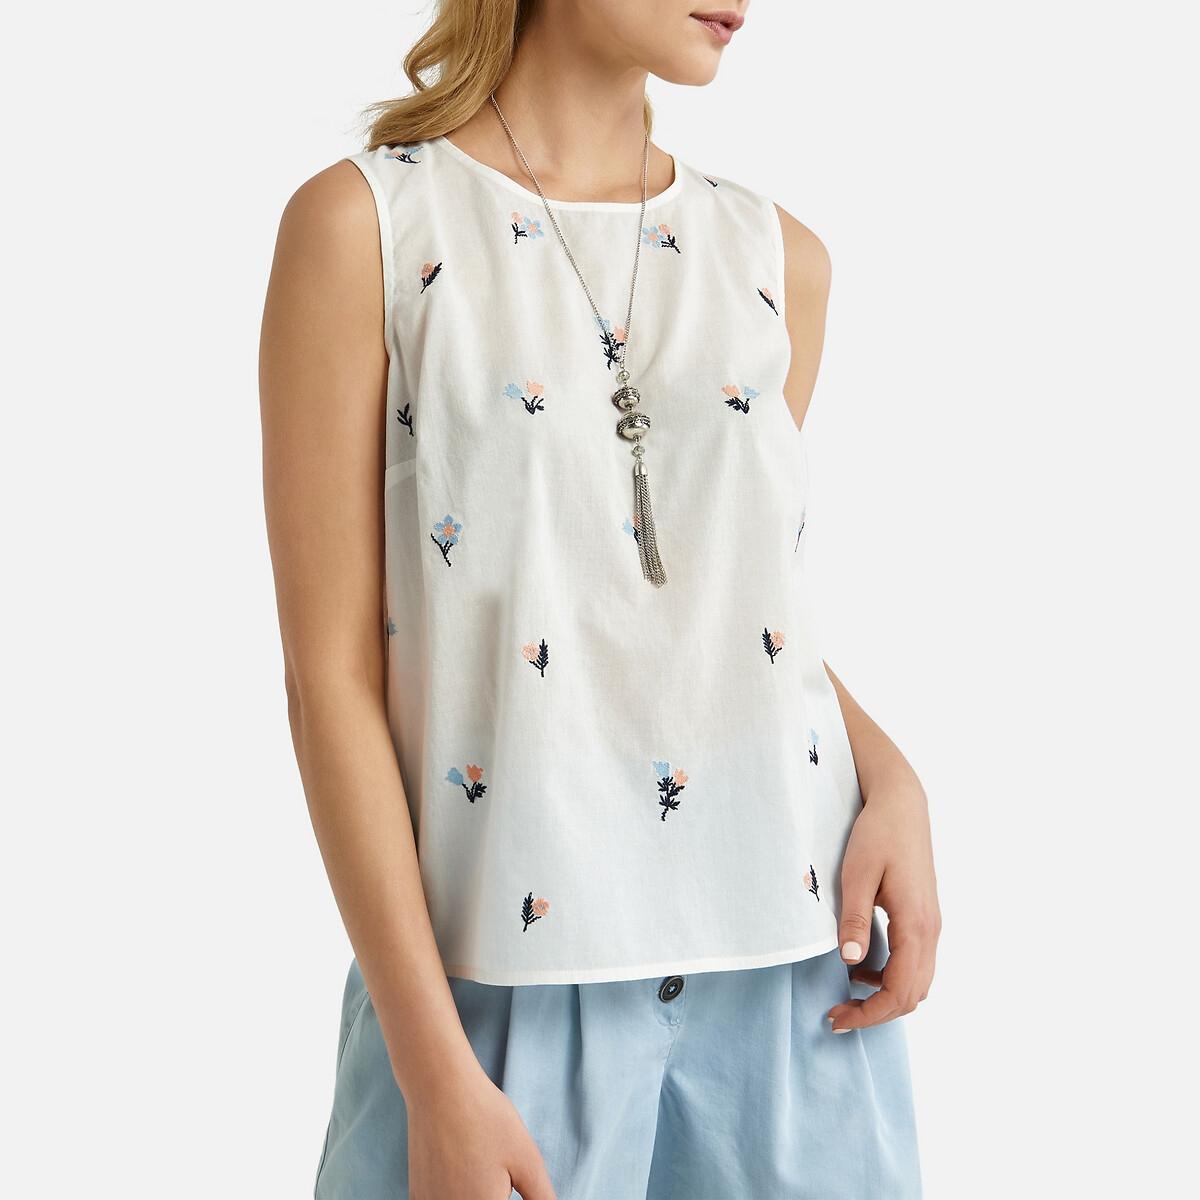 цена на Блузка La Redoute С вышивкой без рукавов 52 (FR) - 58 (RUS) белый